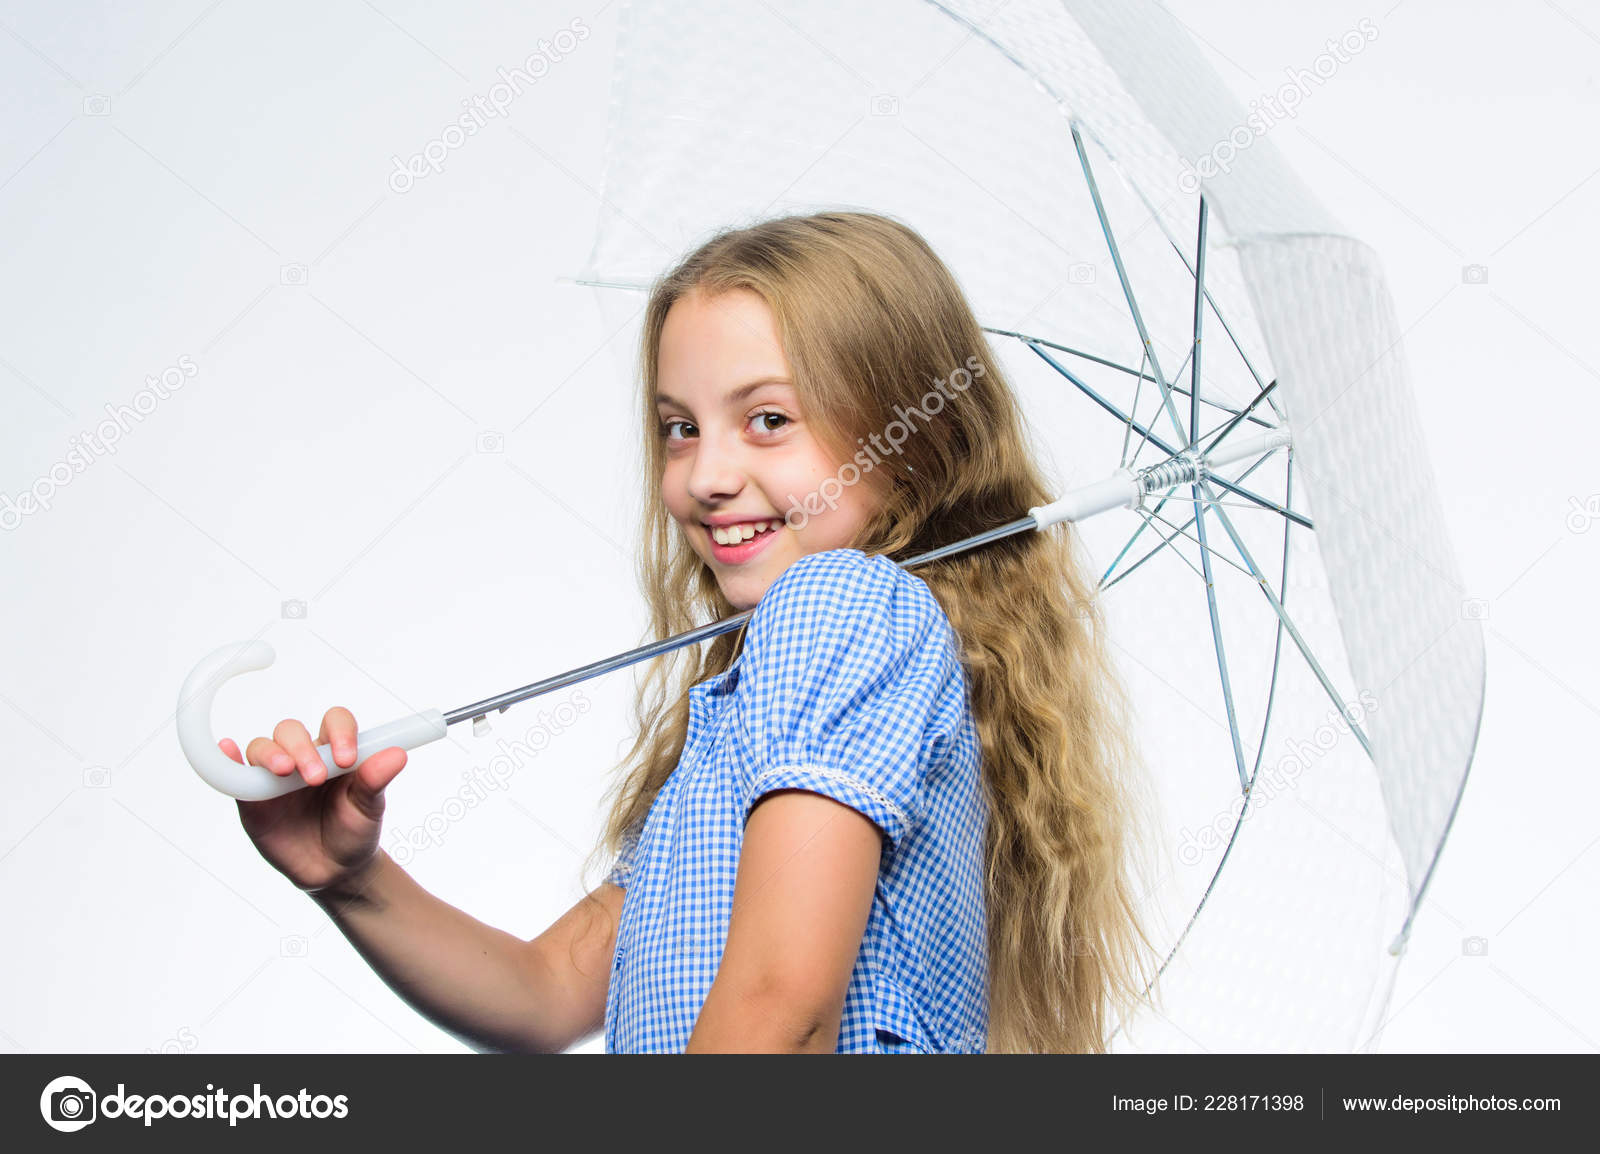 ef8628fec9c Φθινοπωρινή μόδα. Το παιδί. Ευτυχισμένη παιδική ηλικία. Σχολικός χρόνος.  Συναίσθημα που προστατεύονται σε αυτή ημέρα του φθινοπώρου.